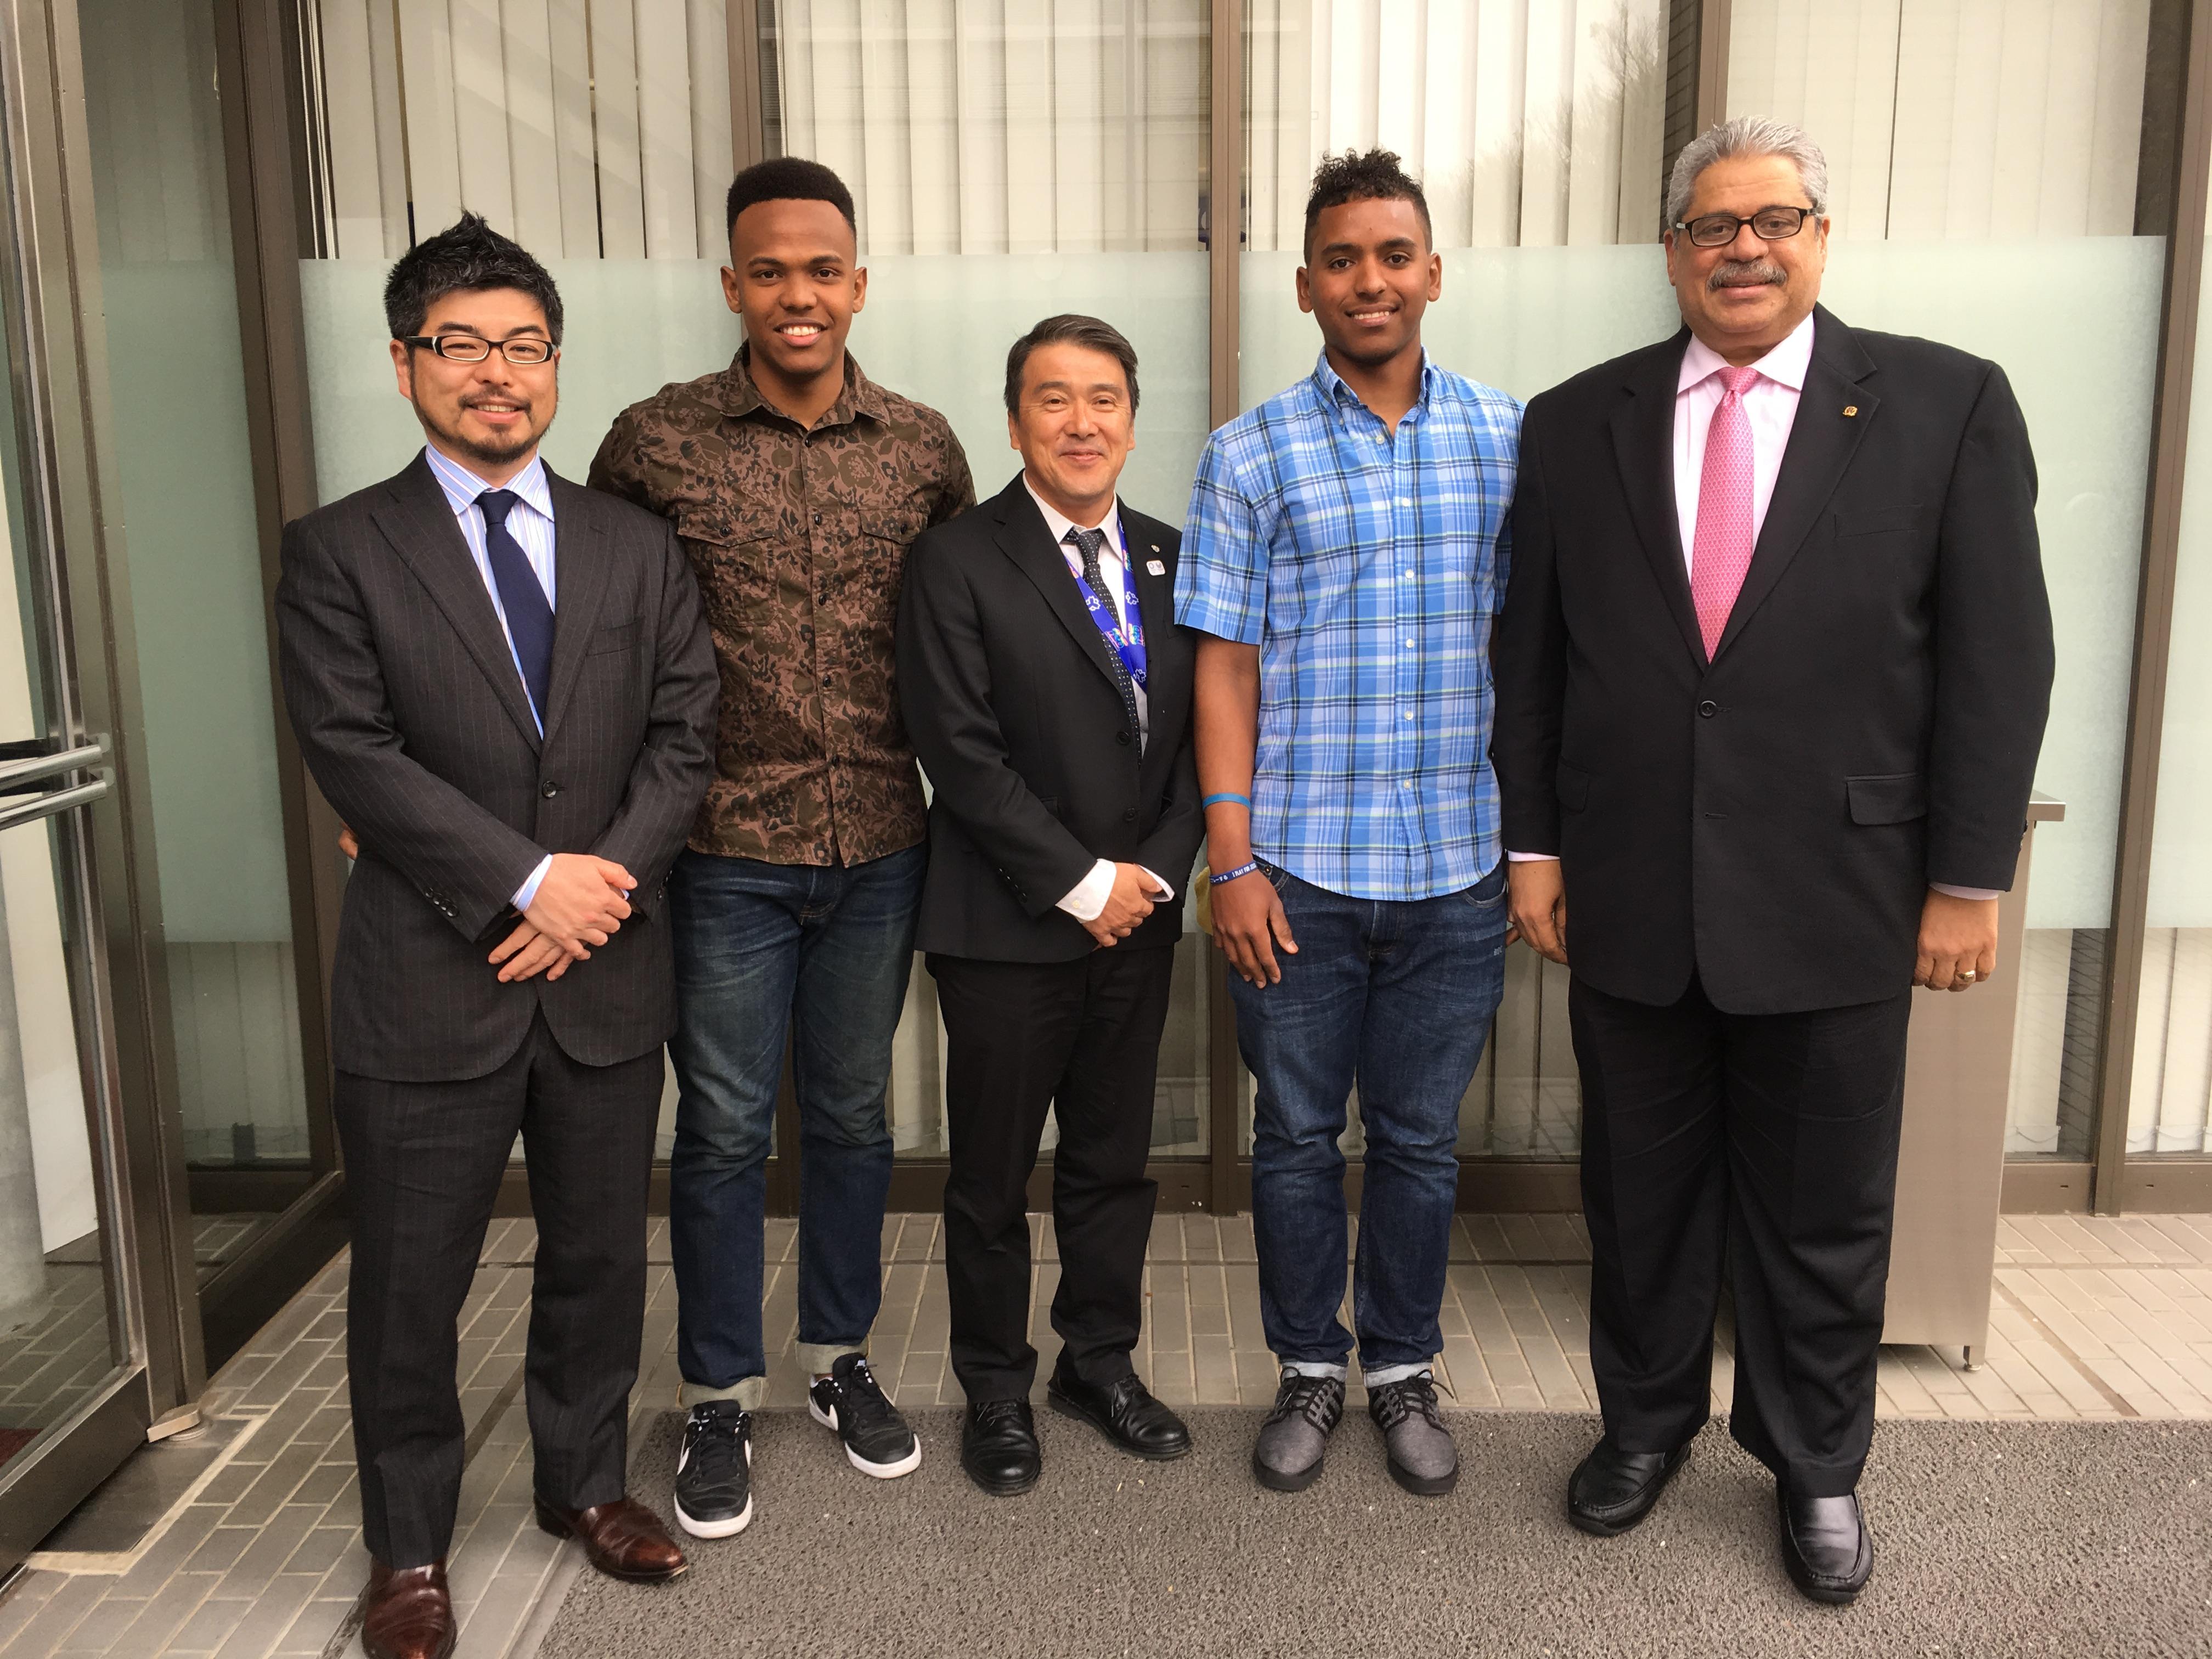 日本体育大学を訪問! (Visita a Nippon Sport Science University)